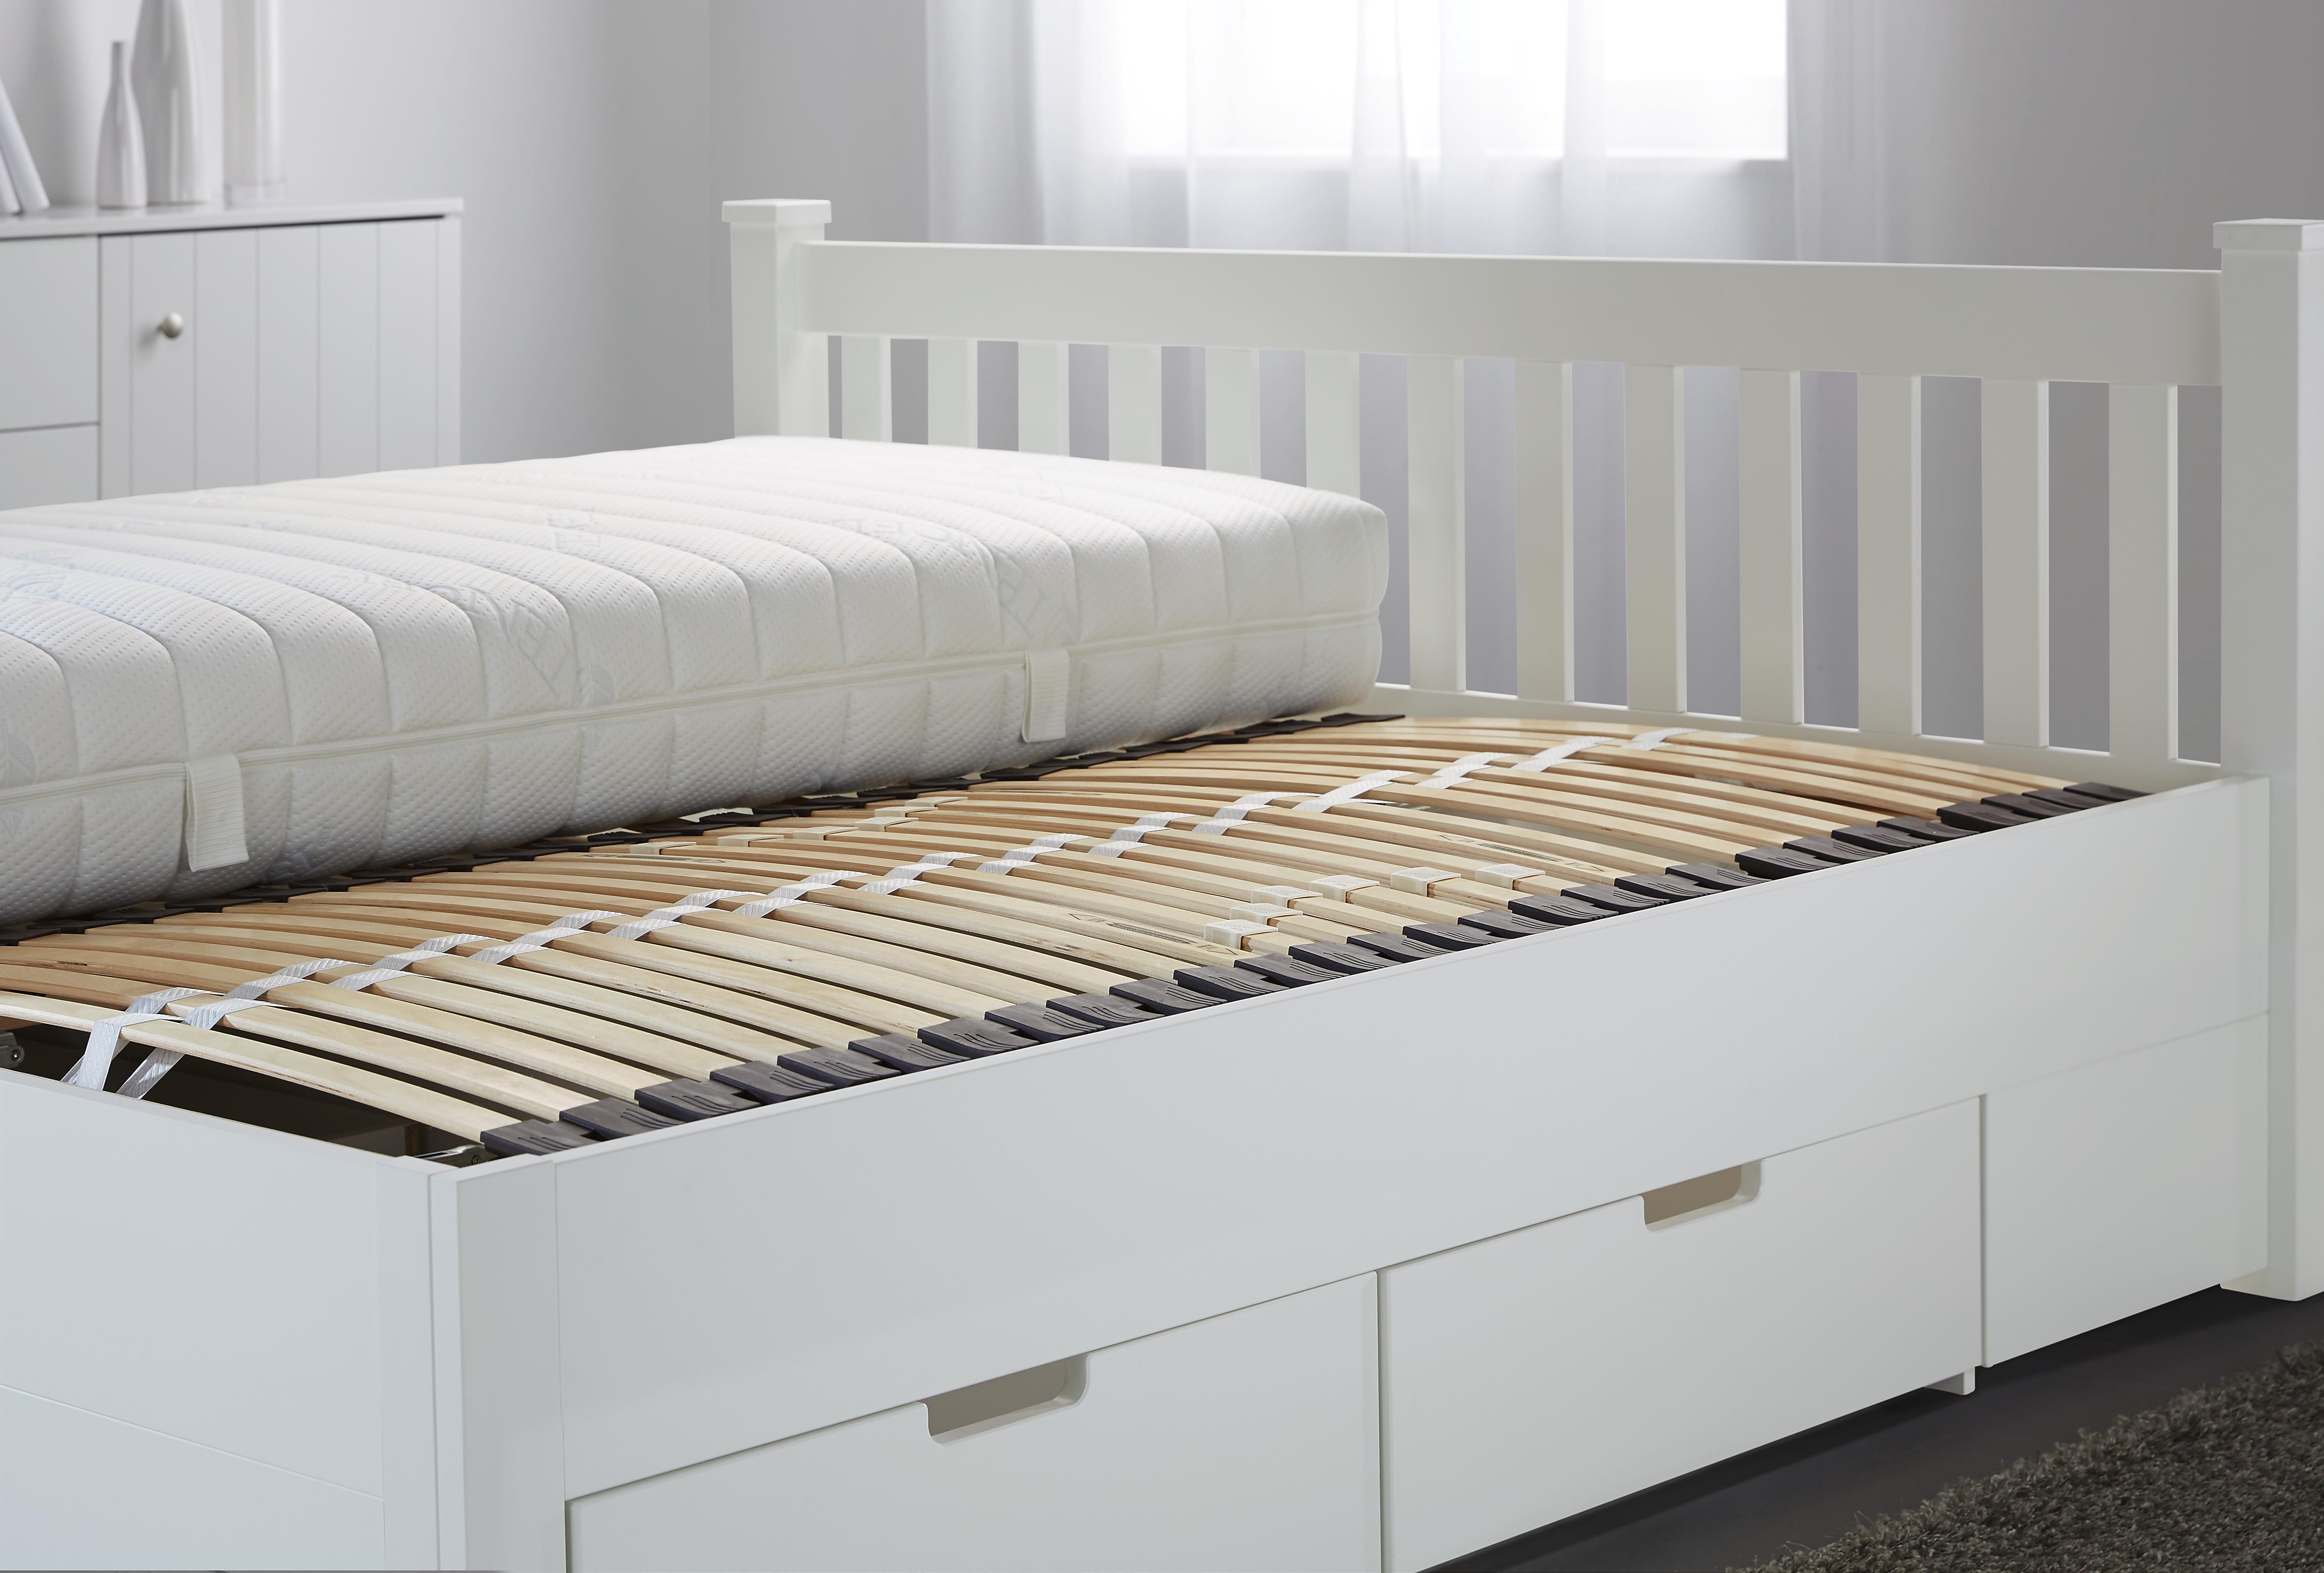 lattenroste 200x140 kopfkissen baumwolle f llung betten lattenroste biber bettw sche 200x200. Black Bedroom Furniture Sets. Home Design Ideas